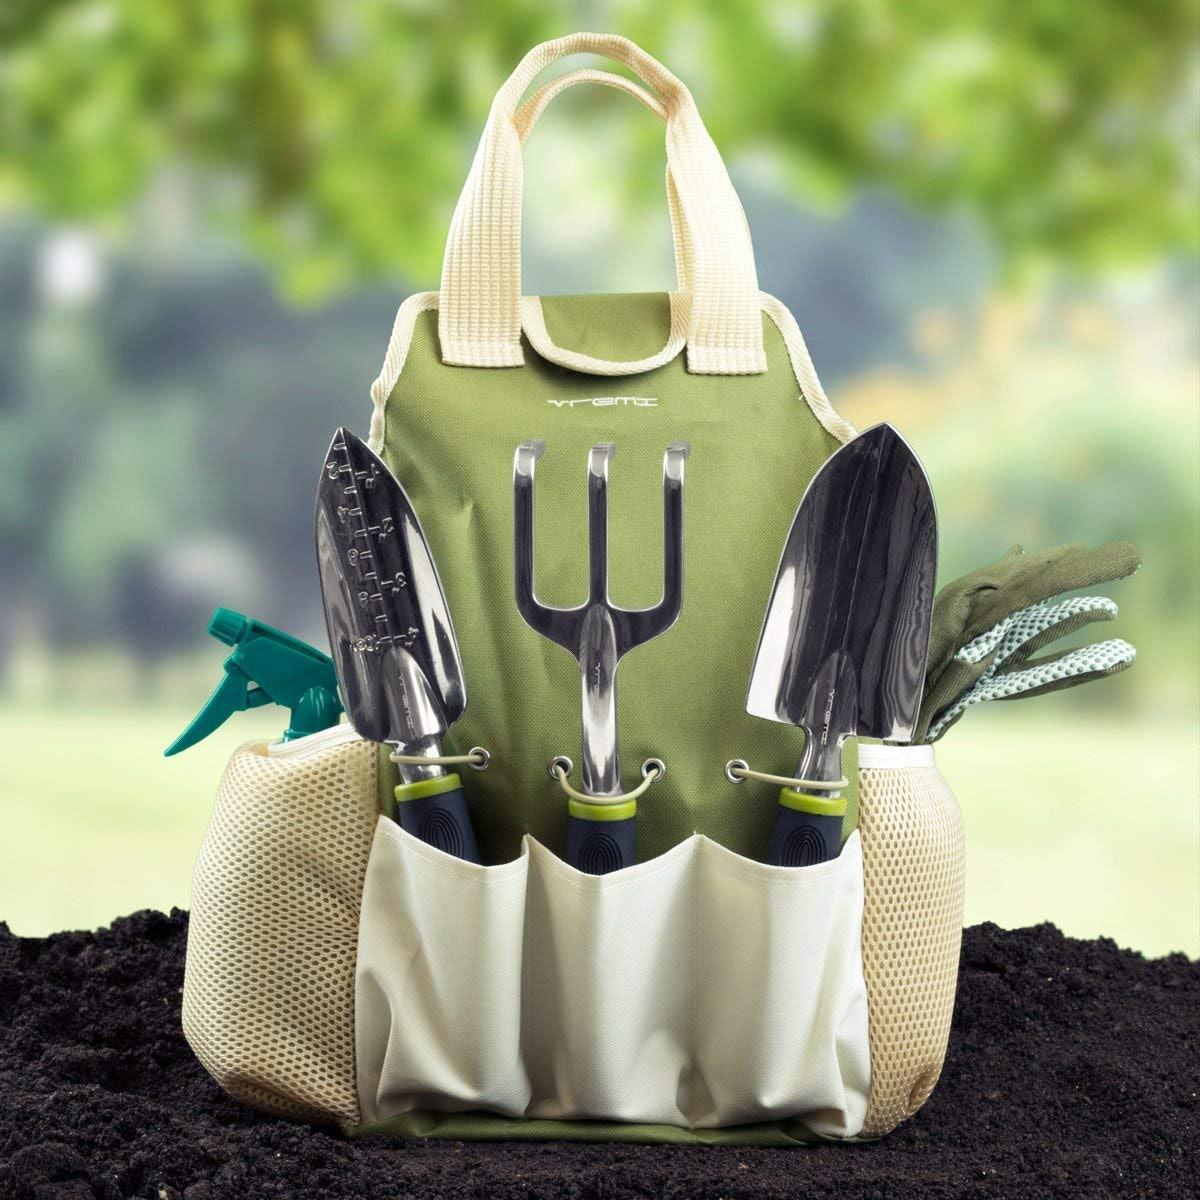 Vremi Garden Tools Set (9-pieces)